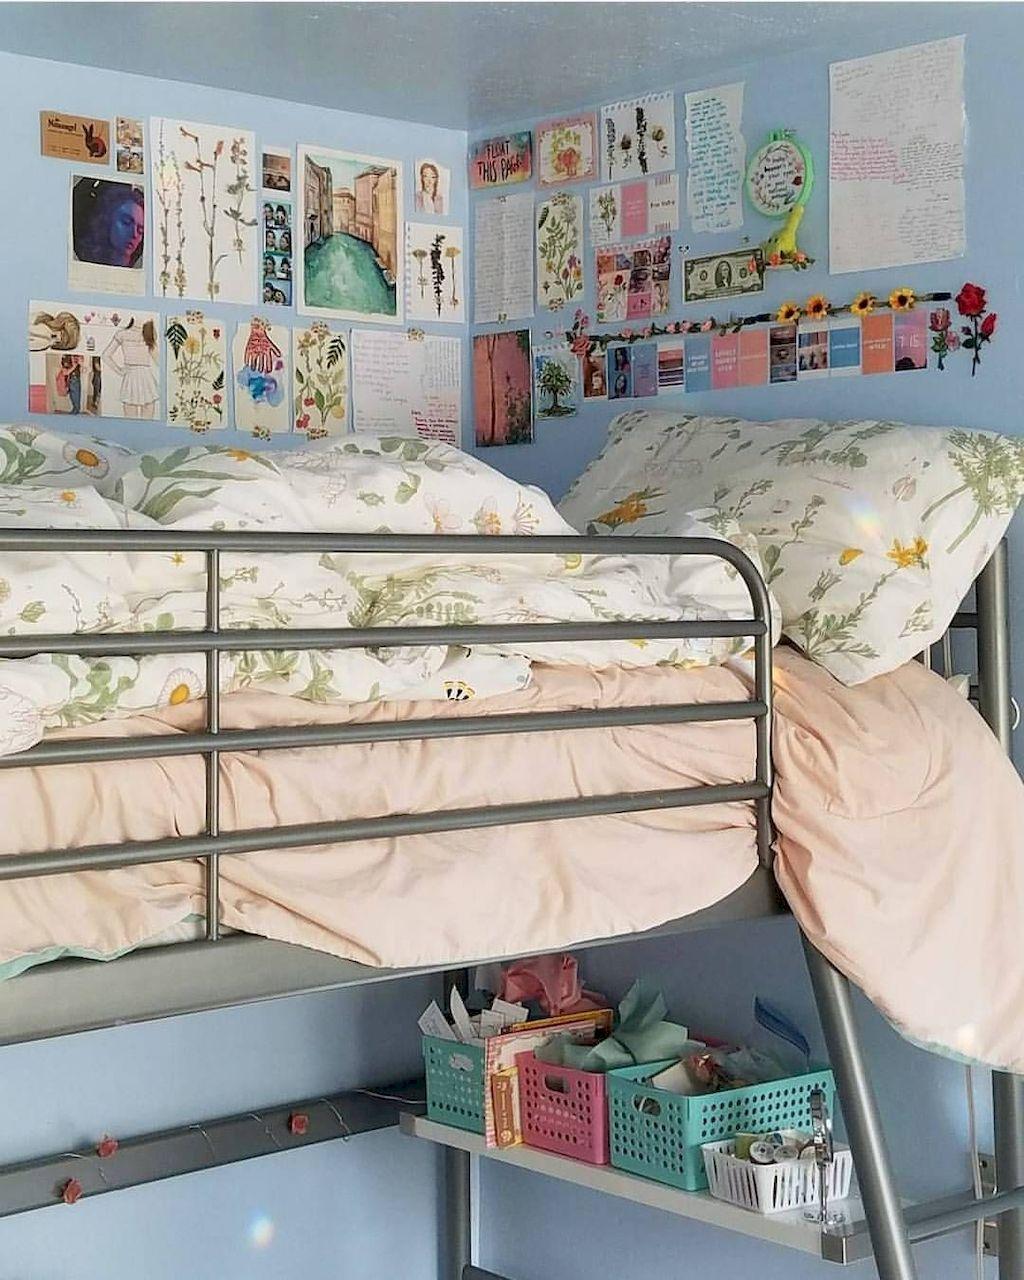 Dorm Room Loft Beds: Pin By Marissa On College Dorm Ideas